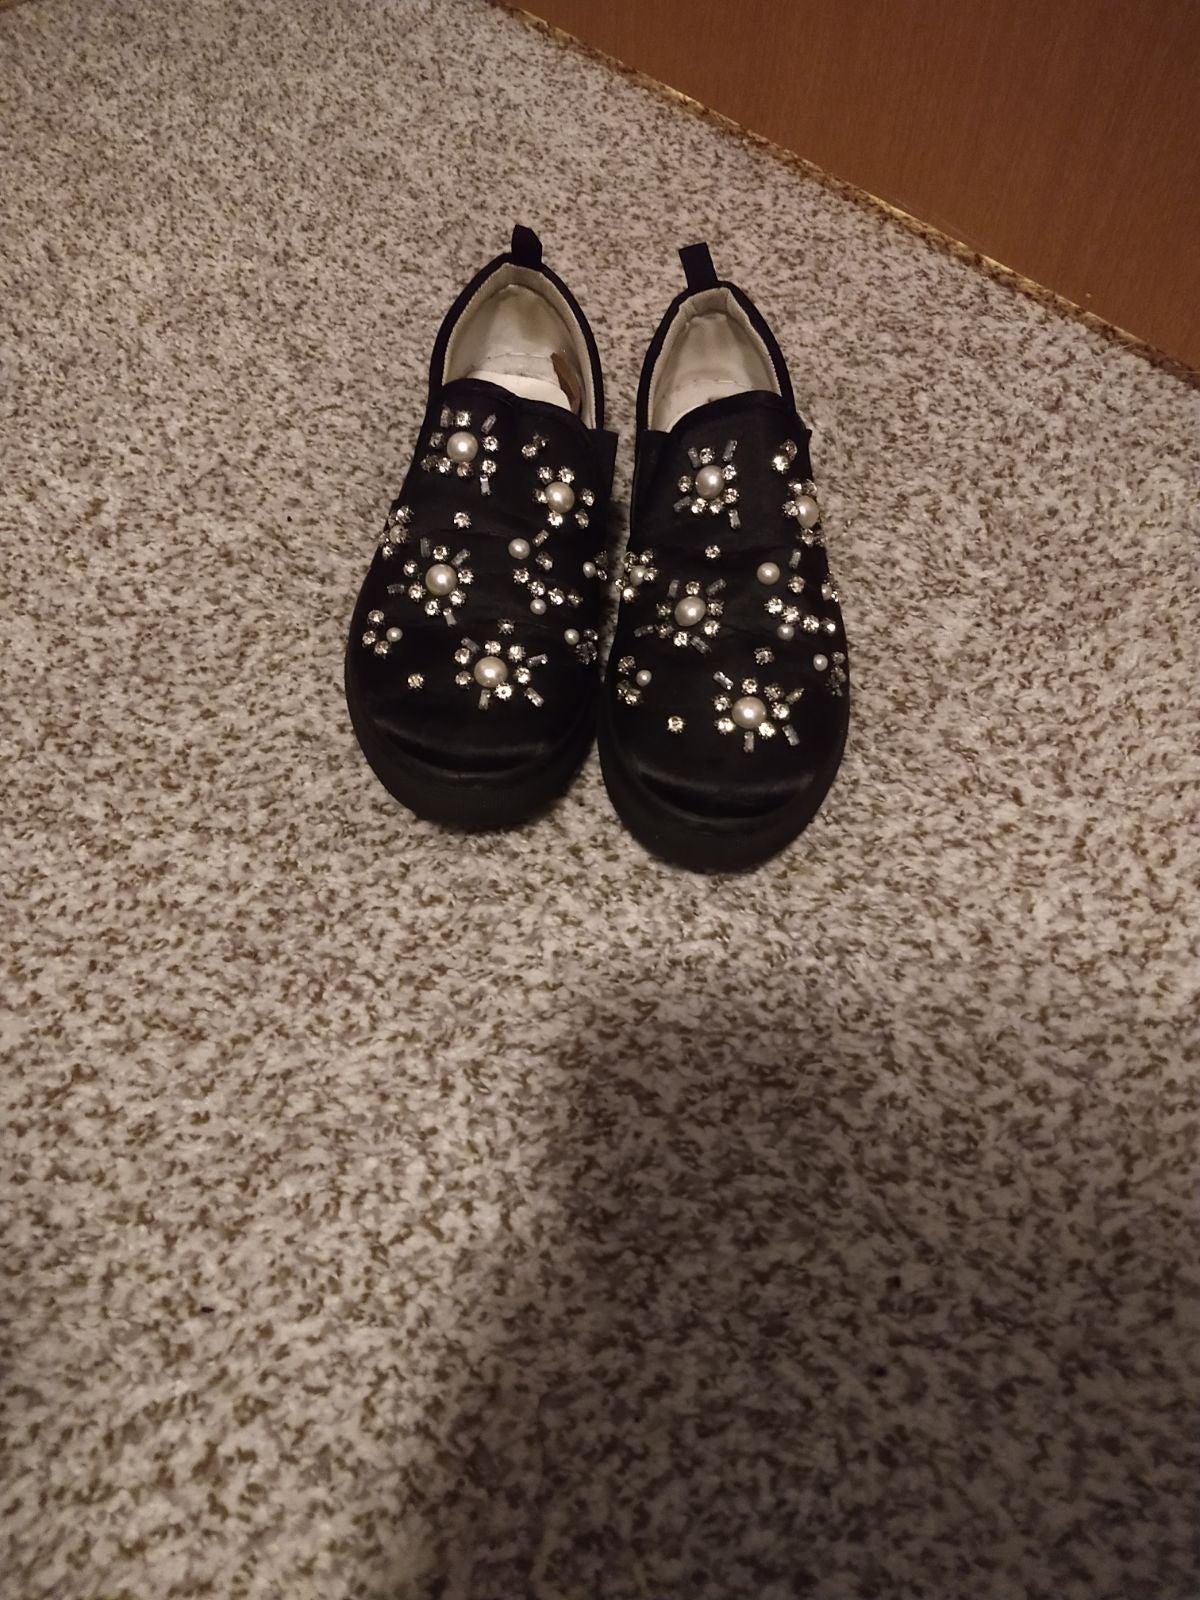 Black flat fashion shoes